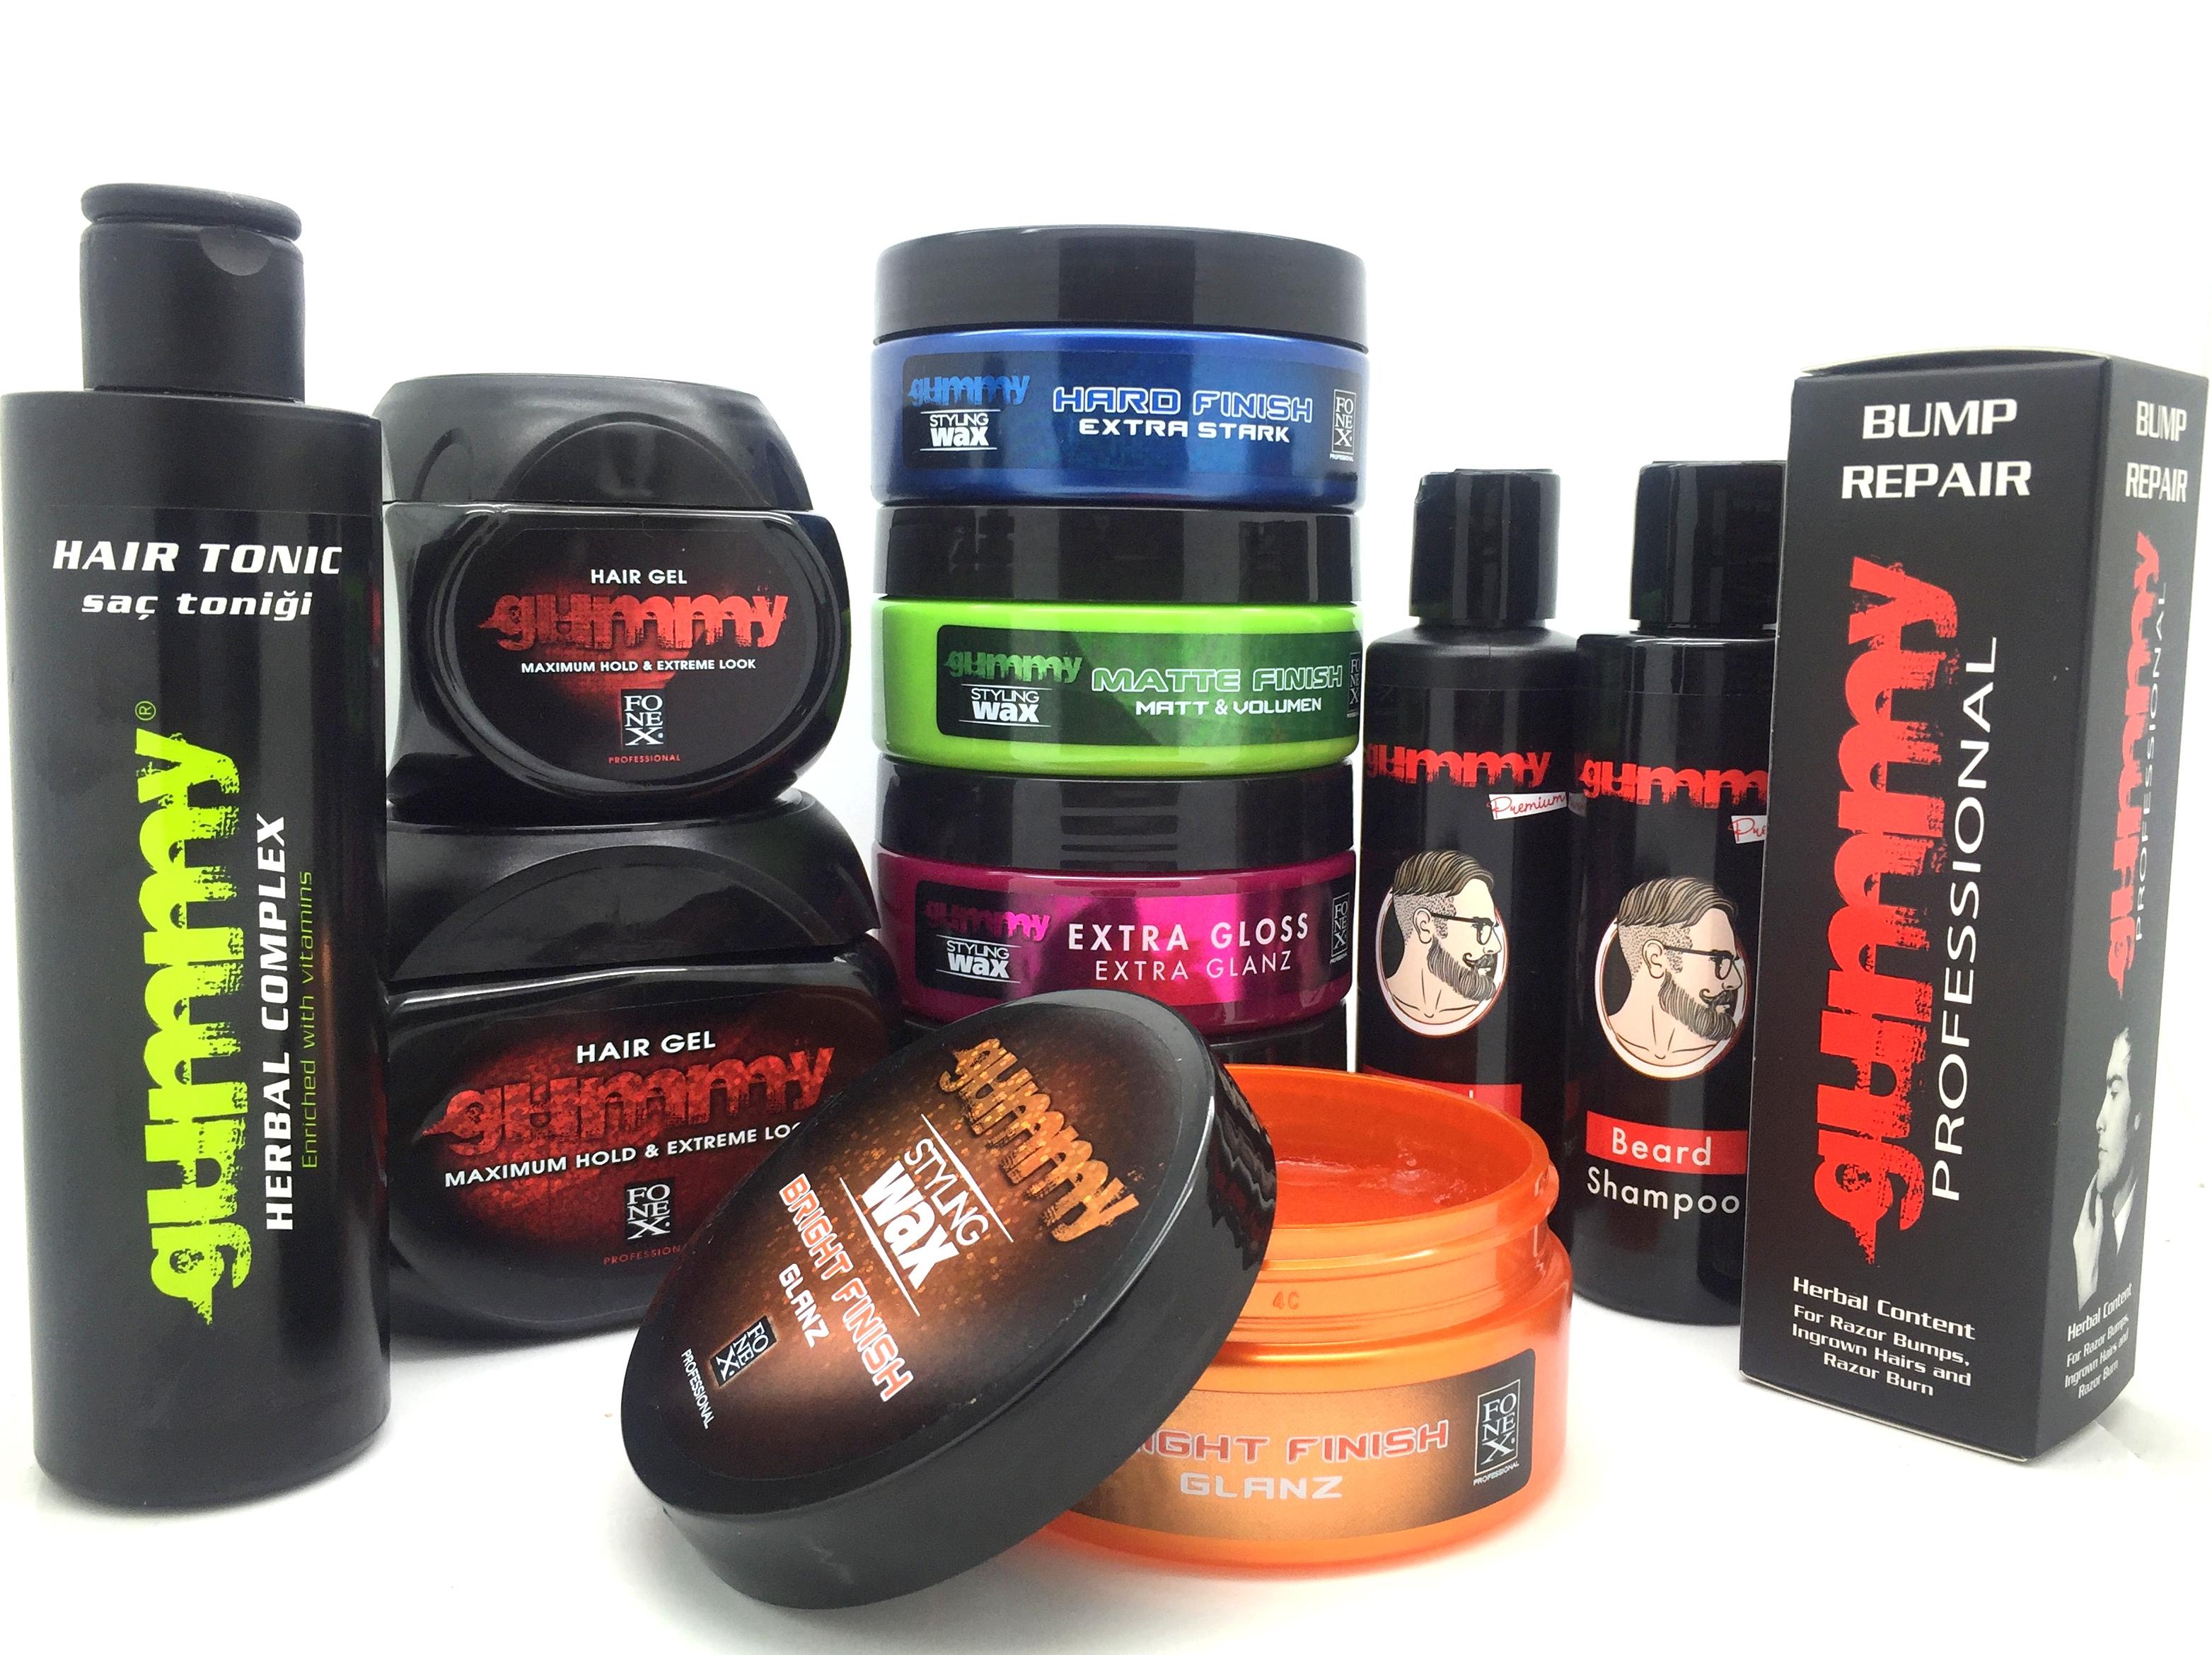 Amazing Gummy Hair Gel Wax Beard Shampoo Conditioner Amp Hair Tonic Short Hairstyles For Black Women Fulllsitofus